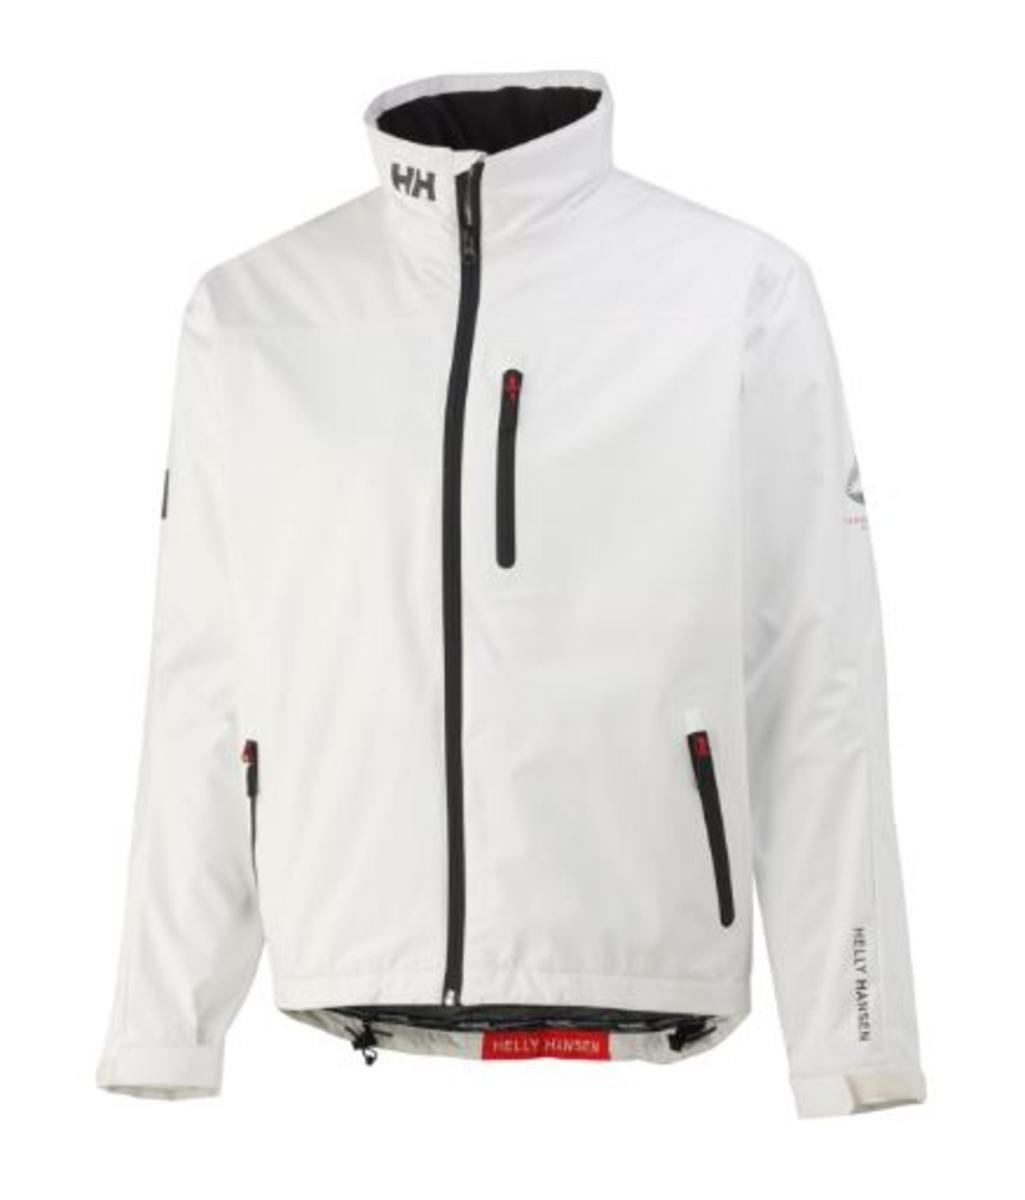 Helly Hansen Mens Crew Midlayer Waterproof Breathable Sailing Jacket